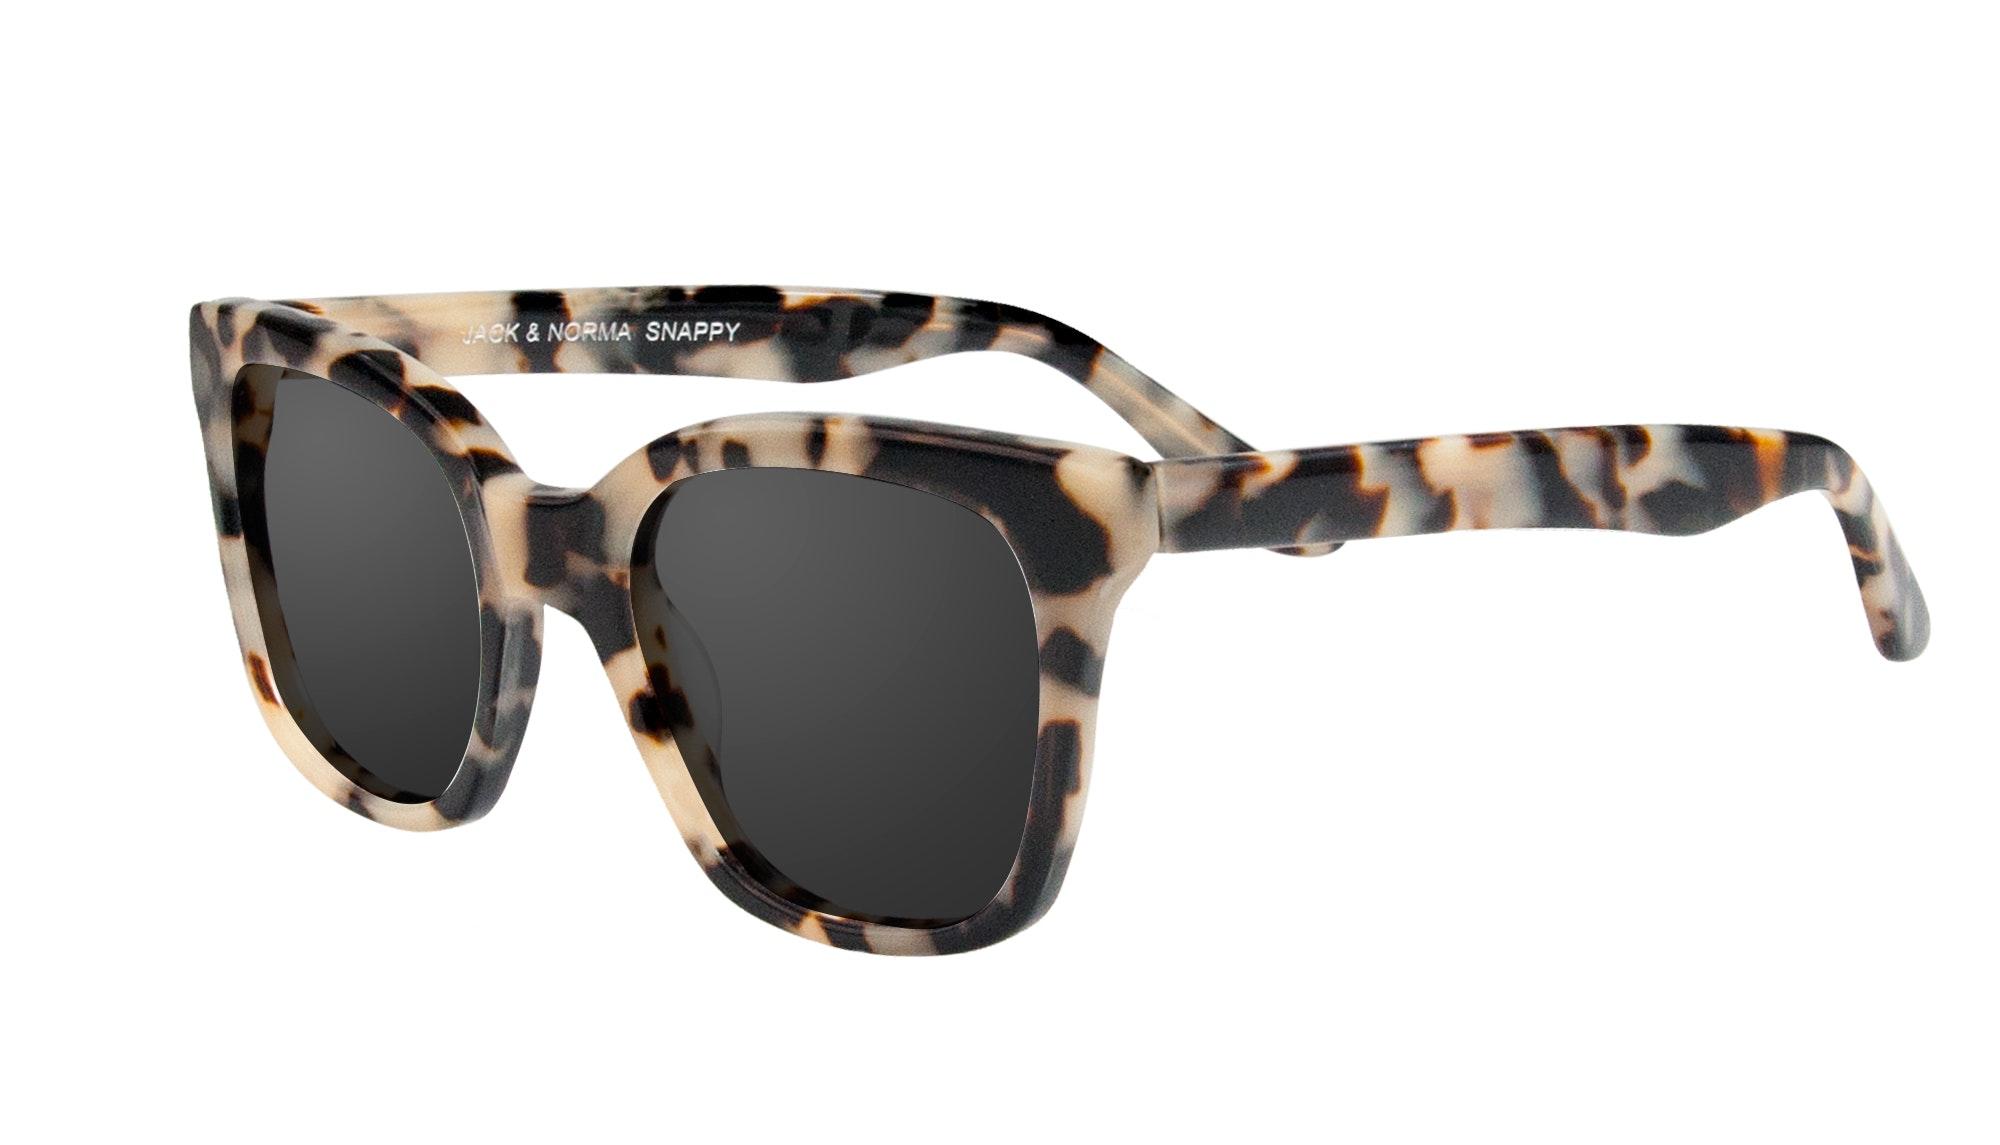 Affordable Fashion Glasses Square Sunglasses Women Jack & Norma Snappy Tilt